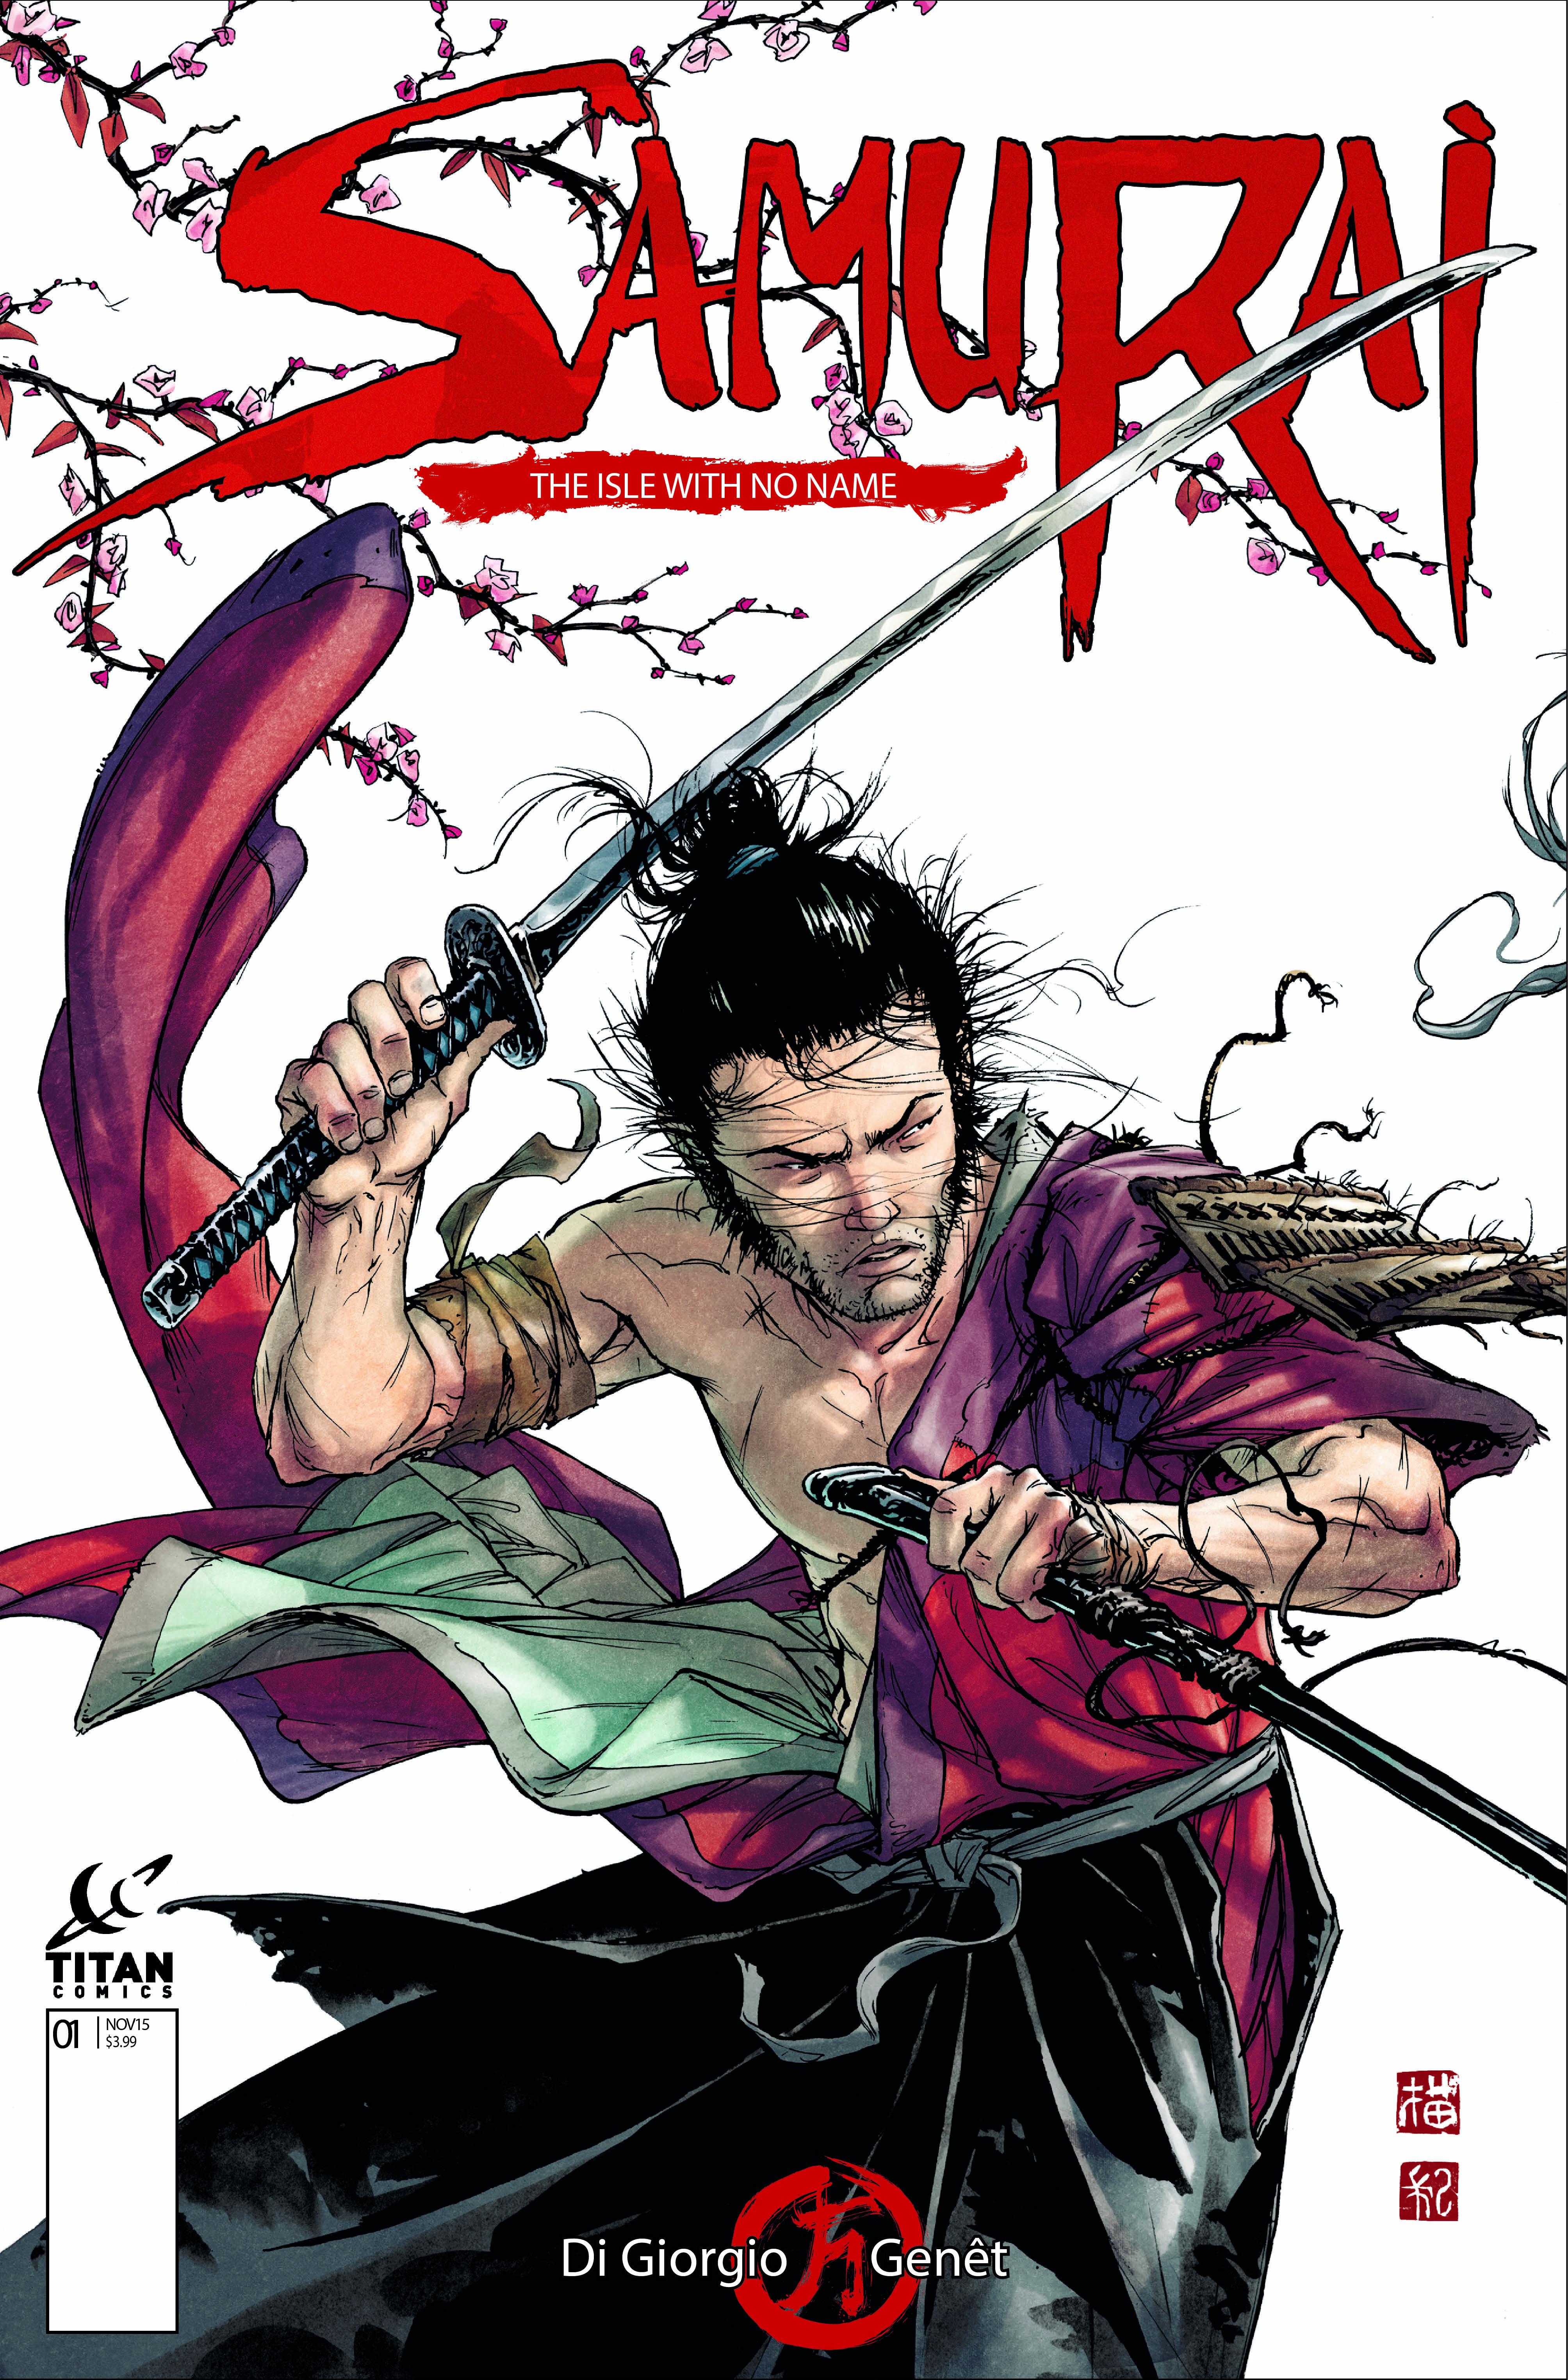 Samurai Comic_1_CoverA_Fr+¬d+¬ric Gen+¬t